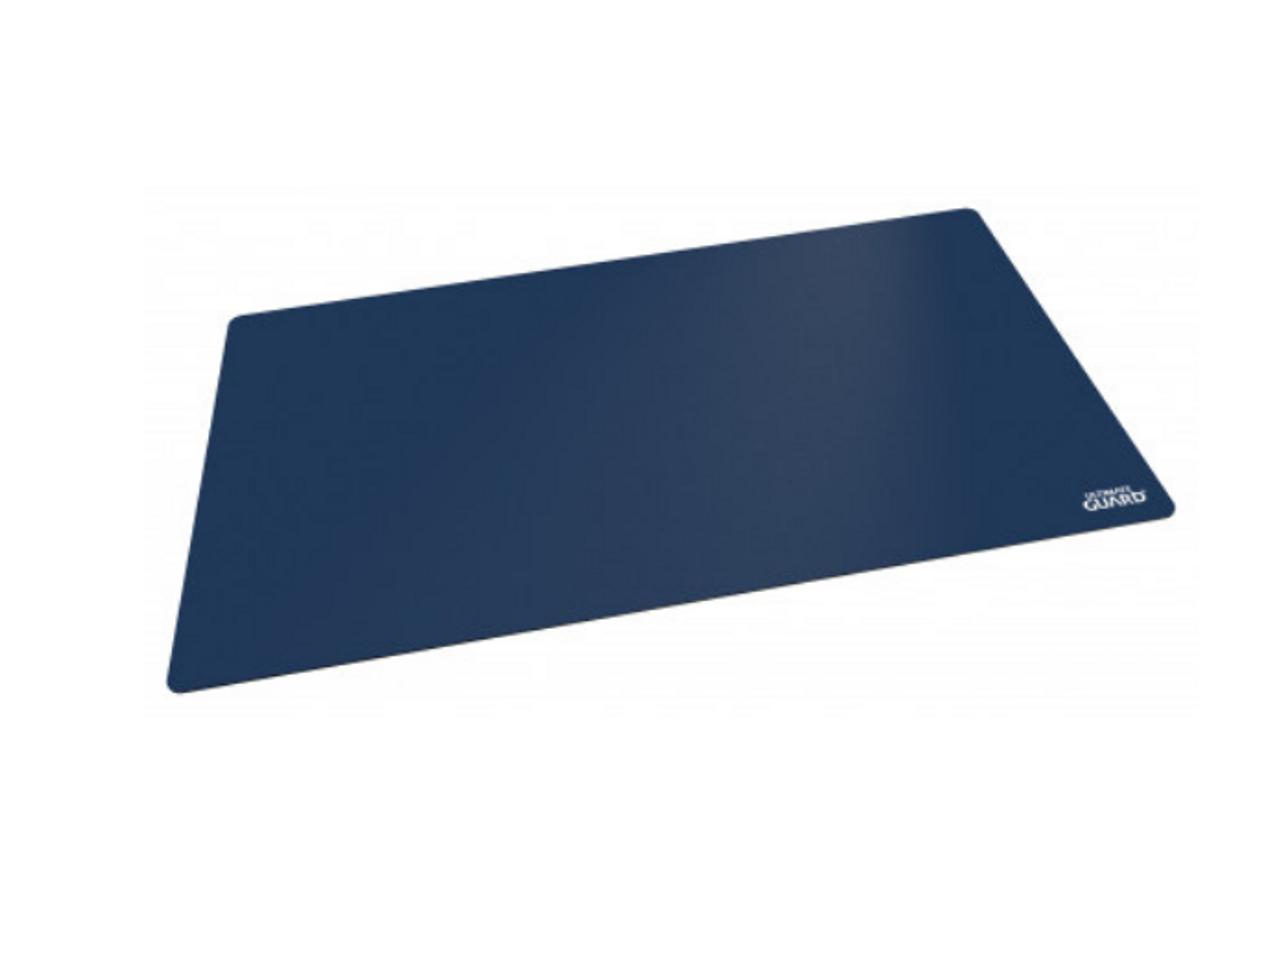 Ultimate Guard - Playmat - Dark Blue - 61x35